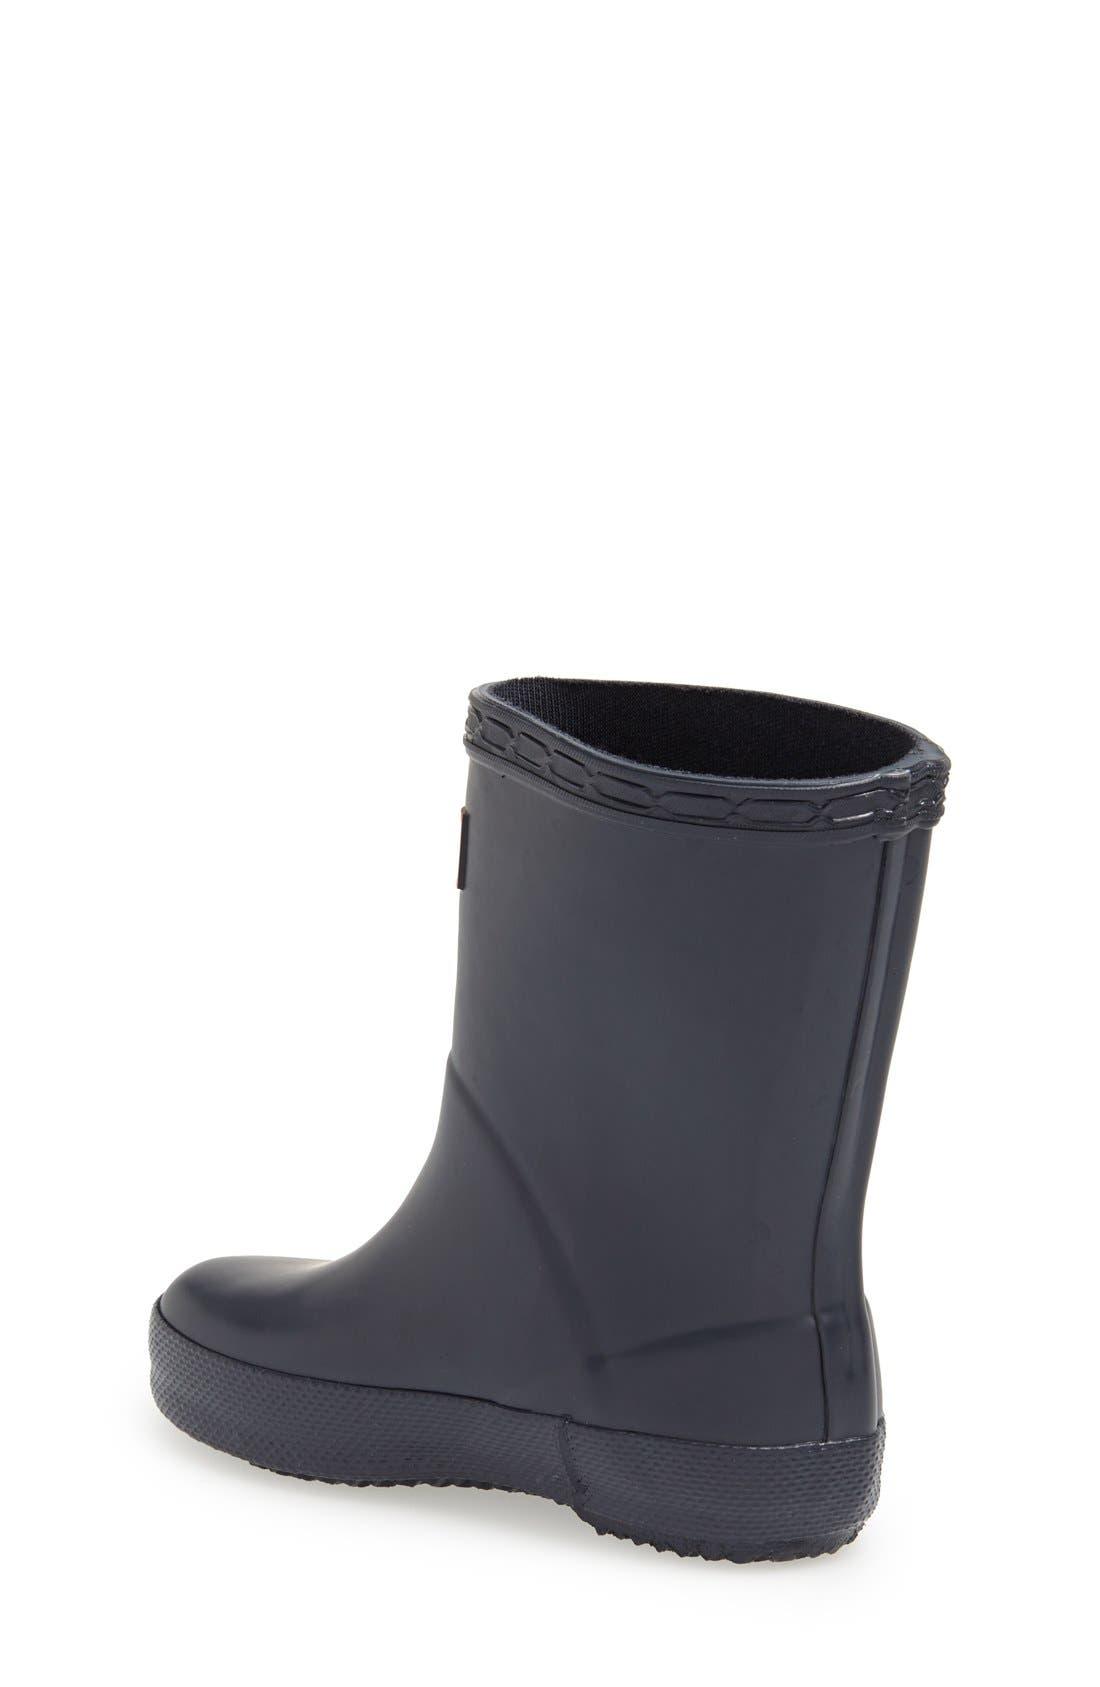 HUNTER,                             First Classic Waterproof Rain Boot,                             Alternate thumbnail 8, color,                             NAVY